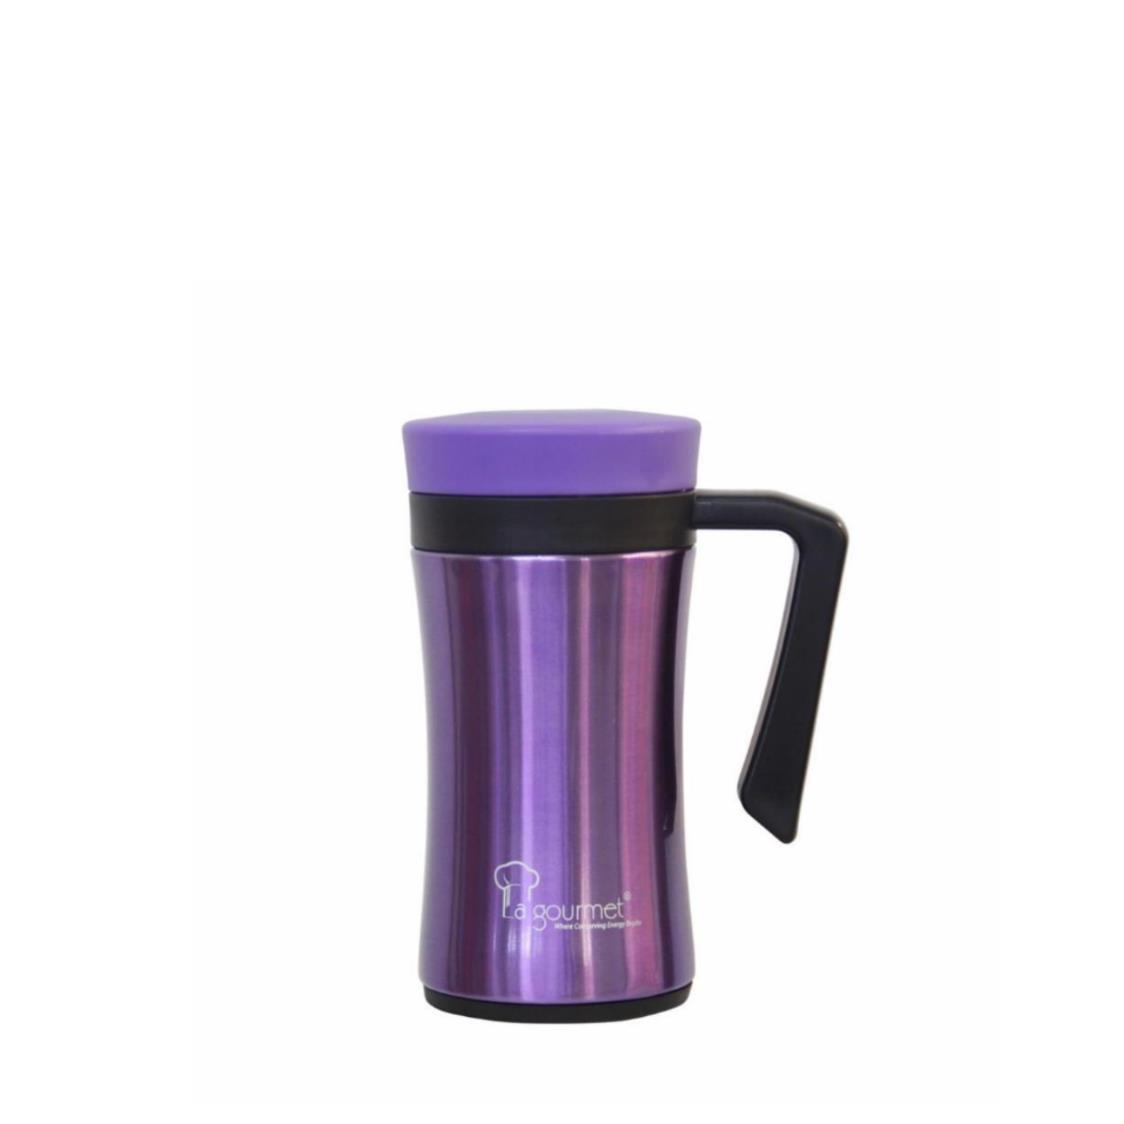 La Gourmet Galaxy Mug Indigo 045L